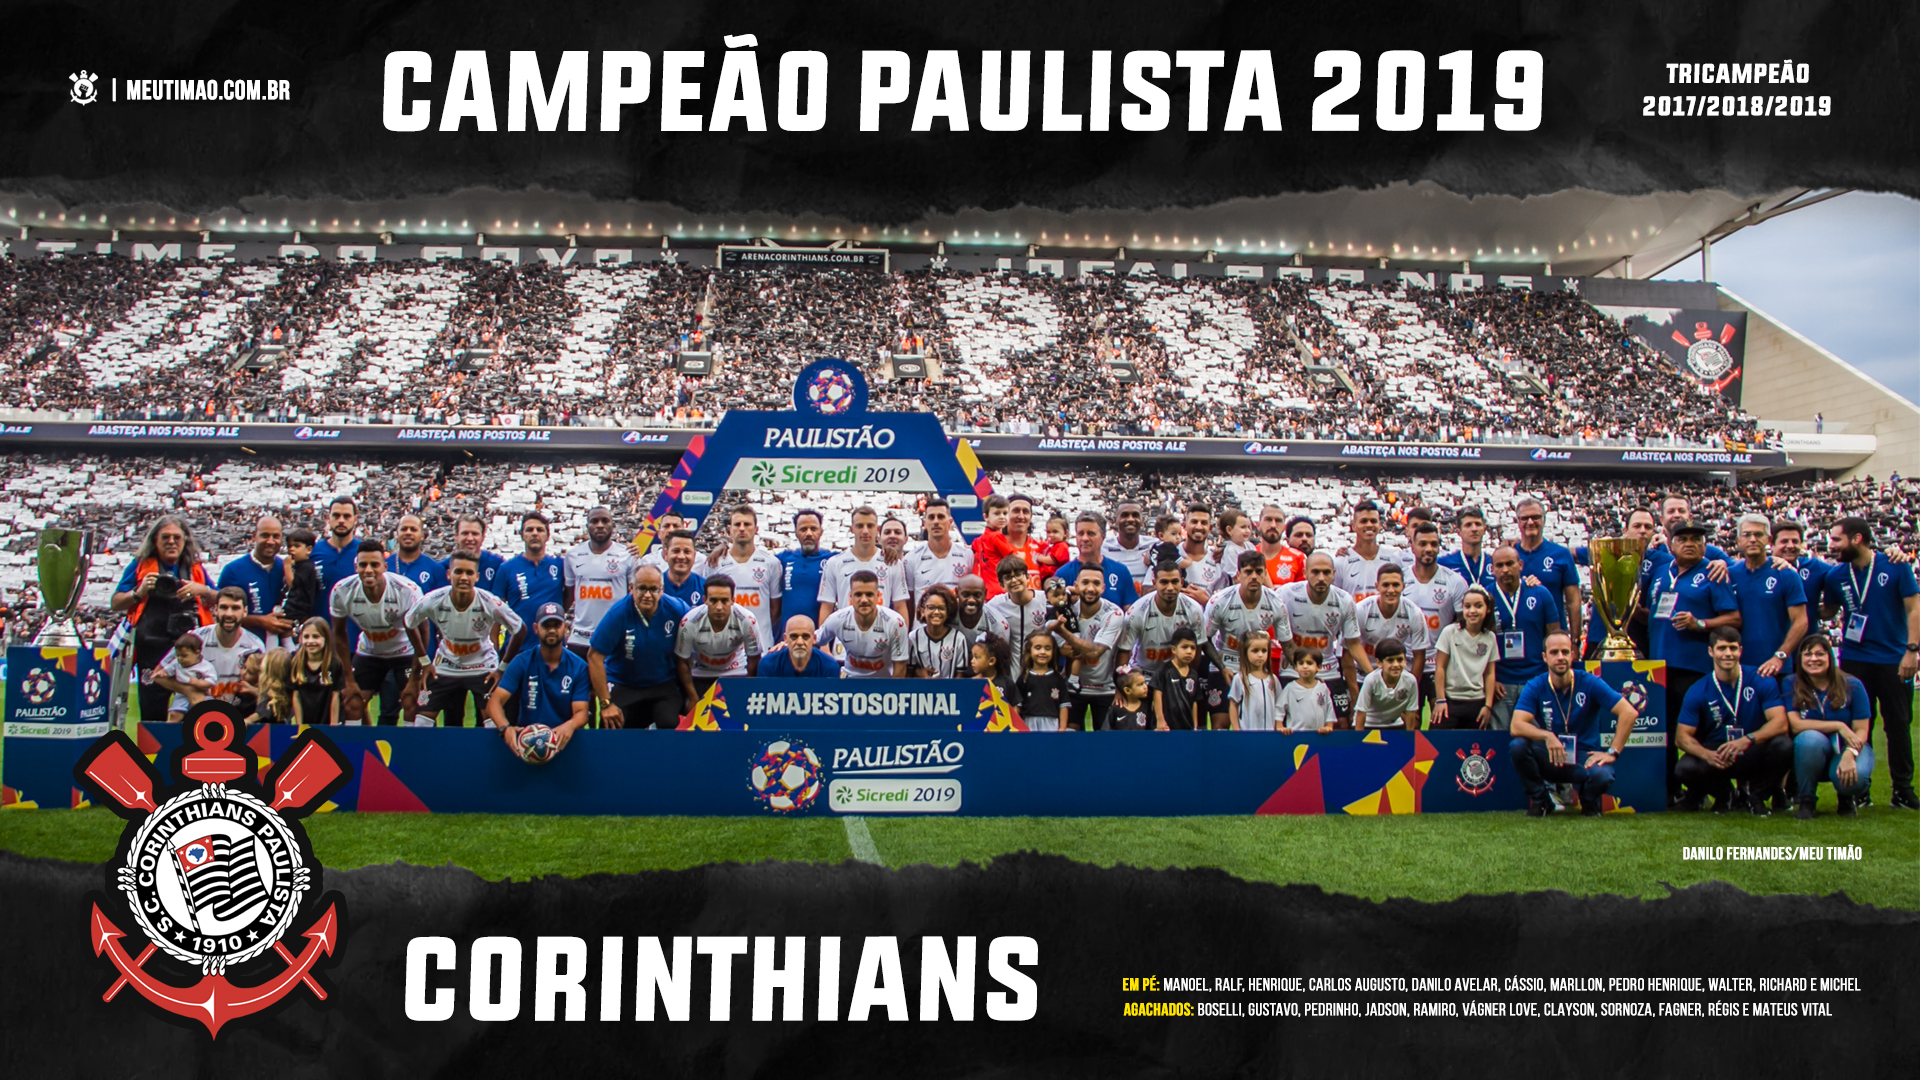 Papeis De Parede E Capas Para Facebook Do Corinthians Tricampeao